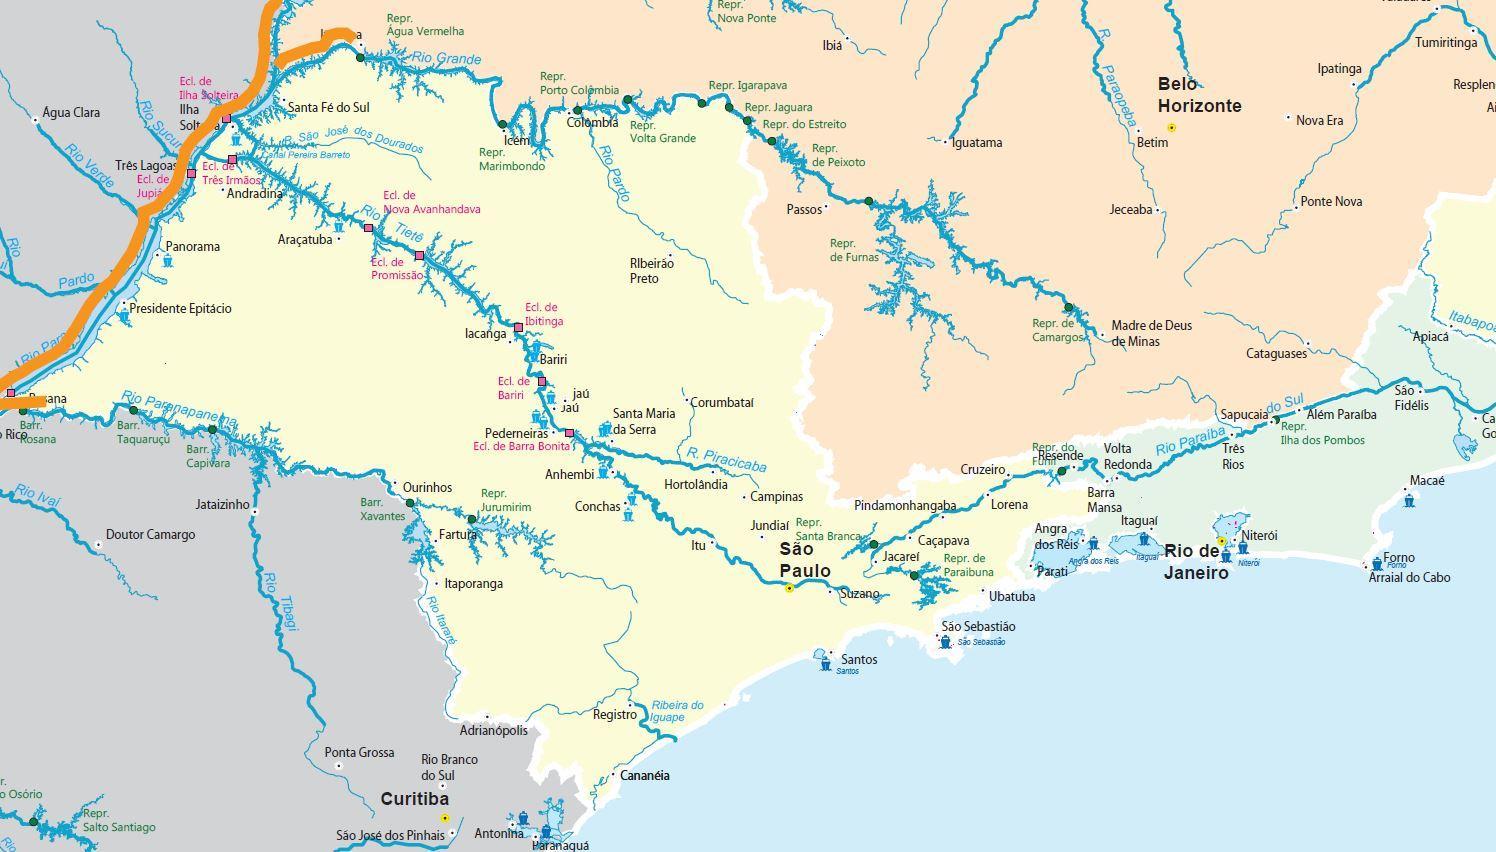 São Paulo Rivers Map Map Of São Paulo Rivers Brazil - Map of sao paulo